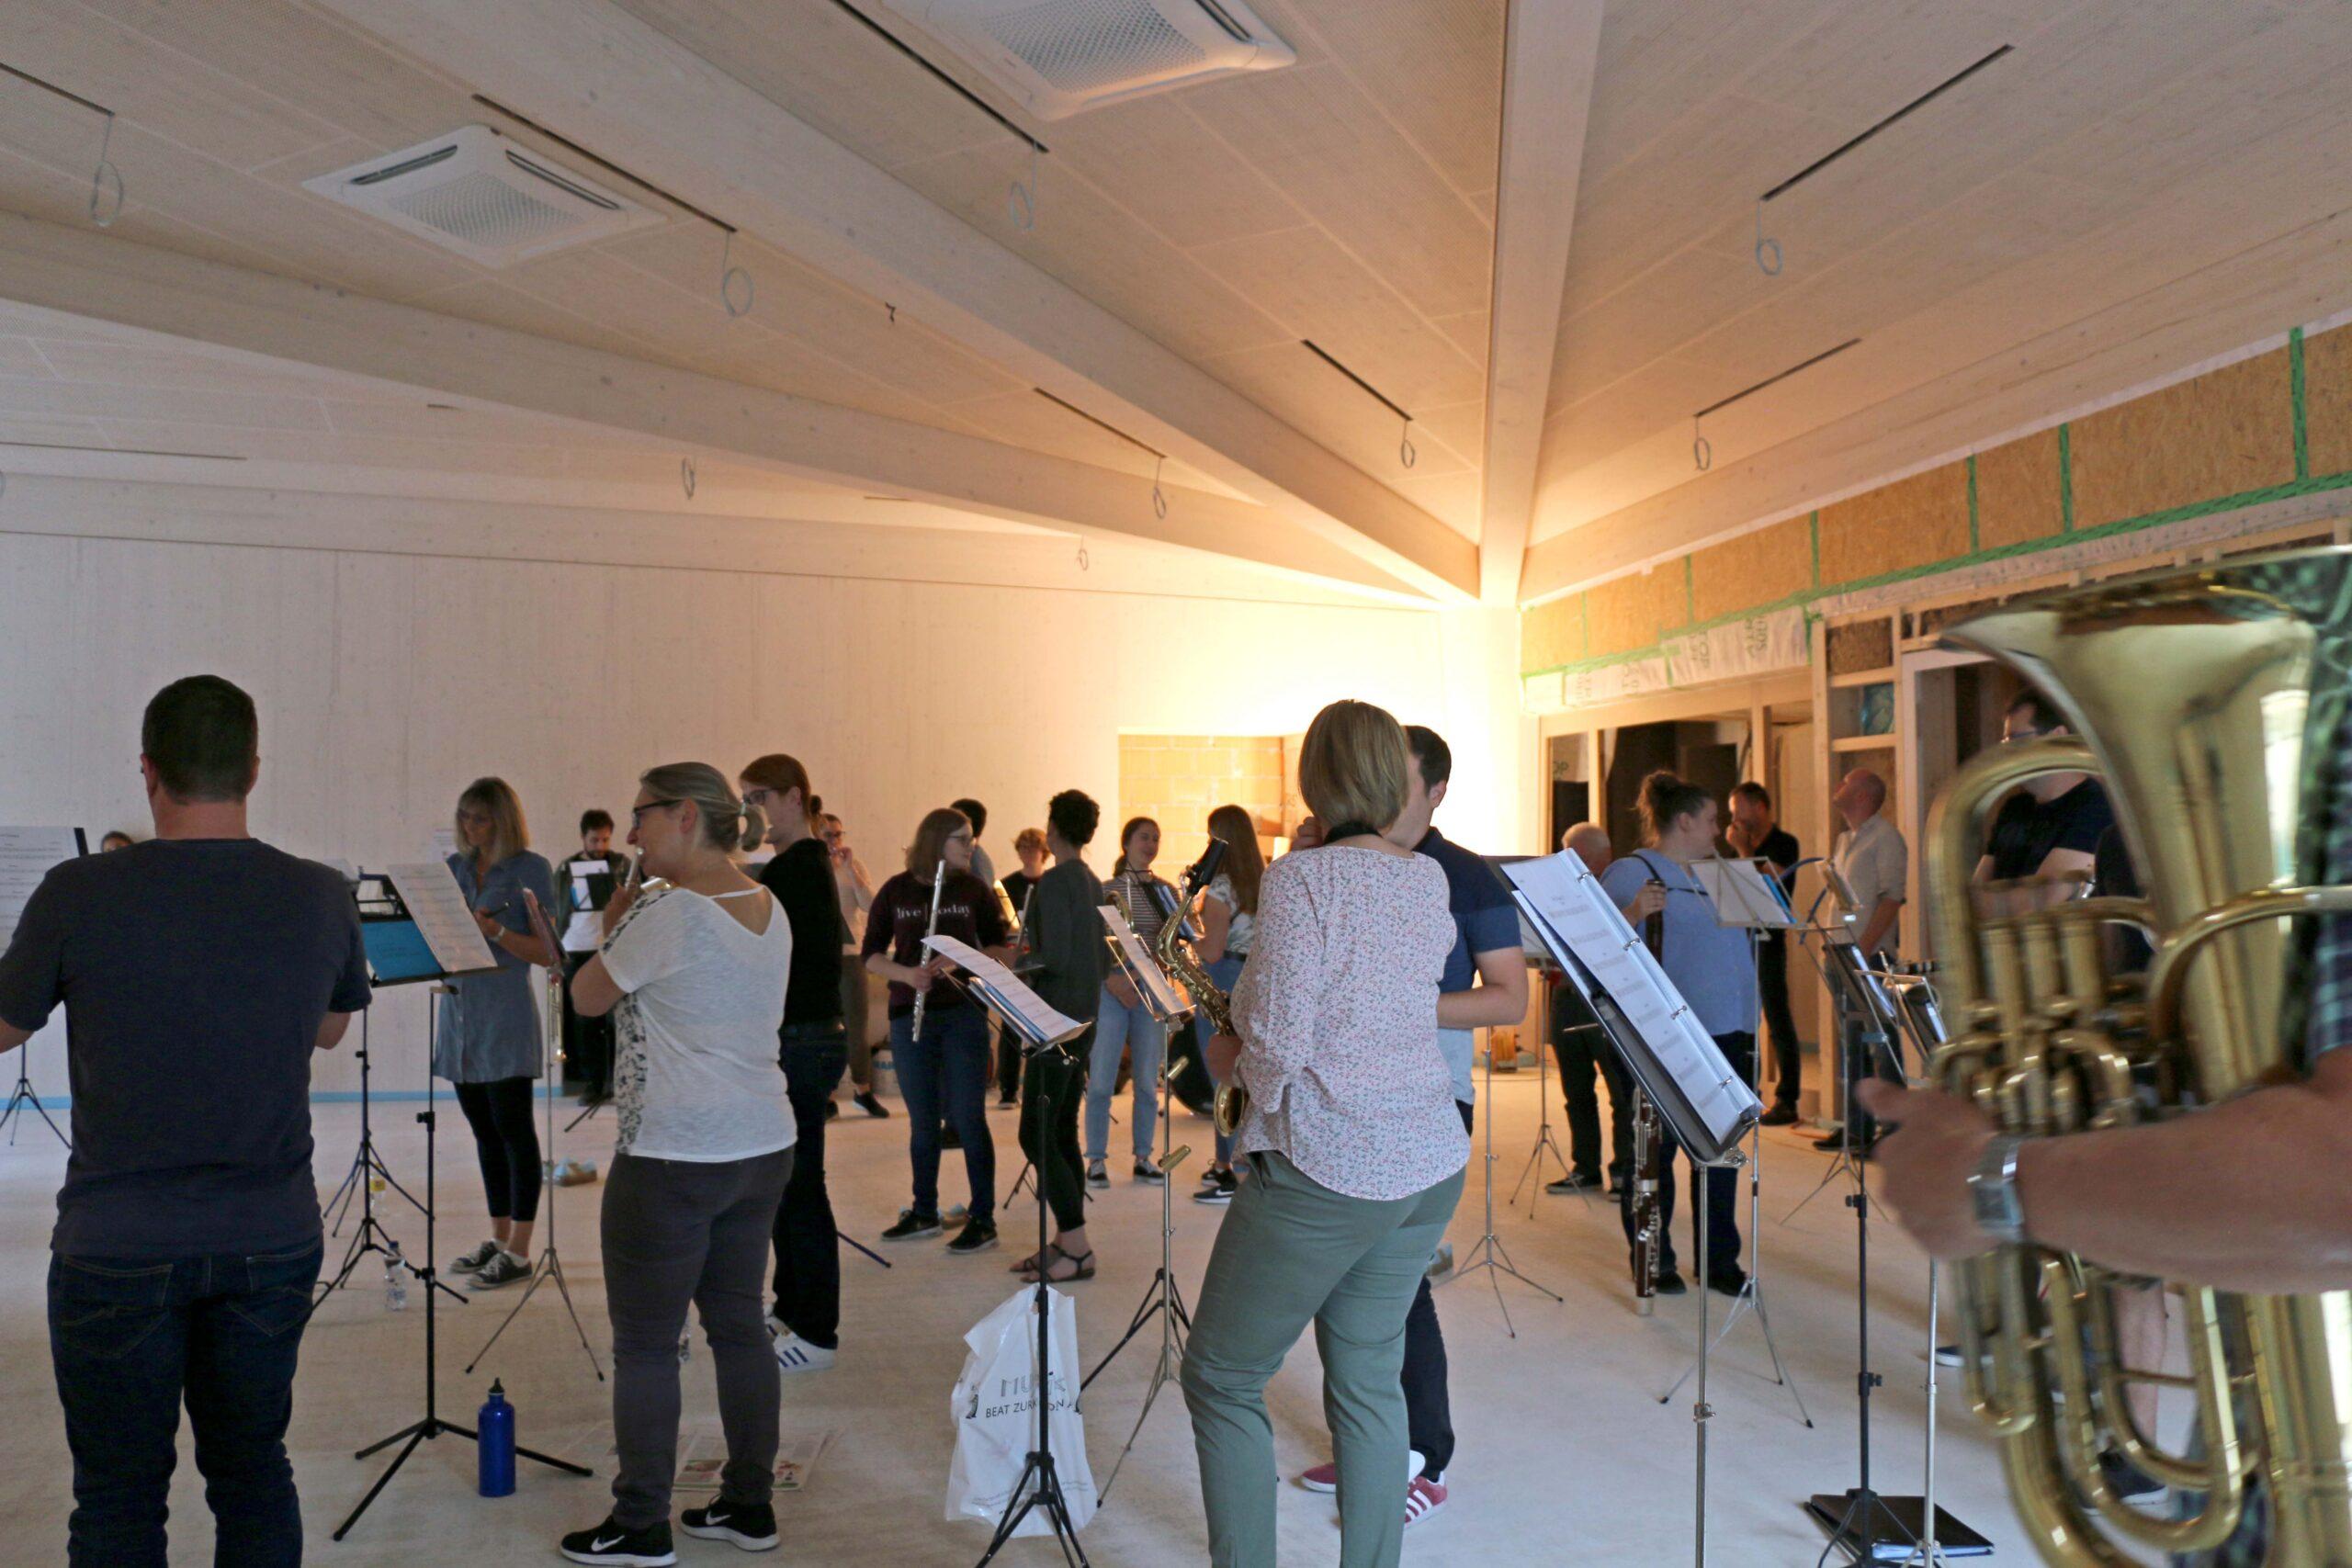 Akustikprobe neues Probelokal, Juni 2020